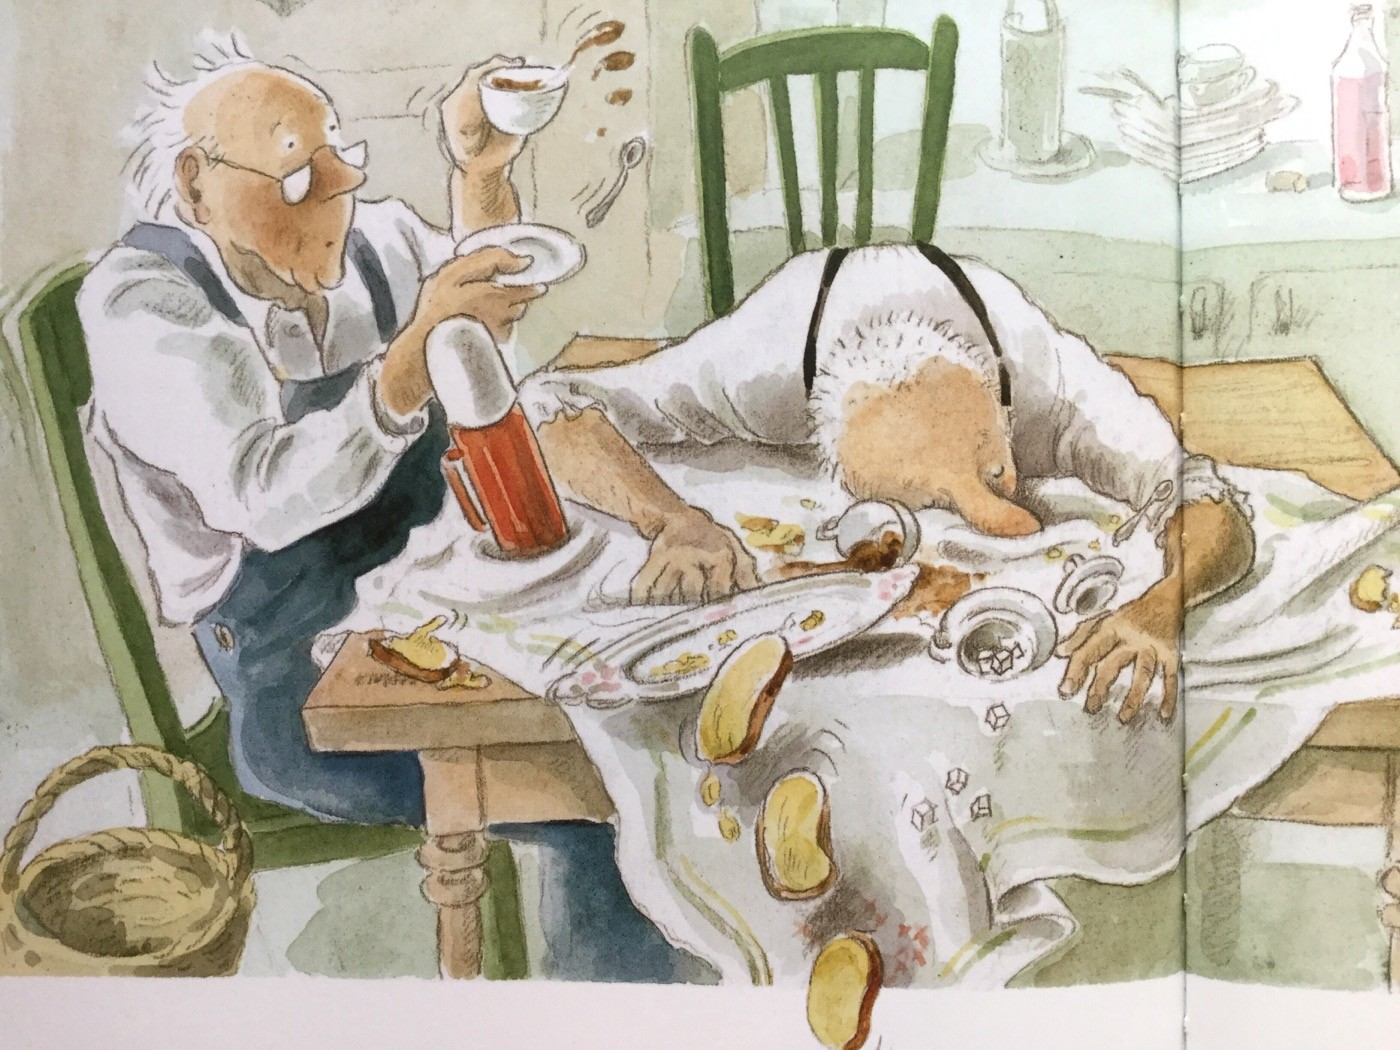 Stinas-sommer-lena-anderson-galline-volanti